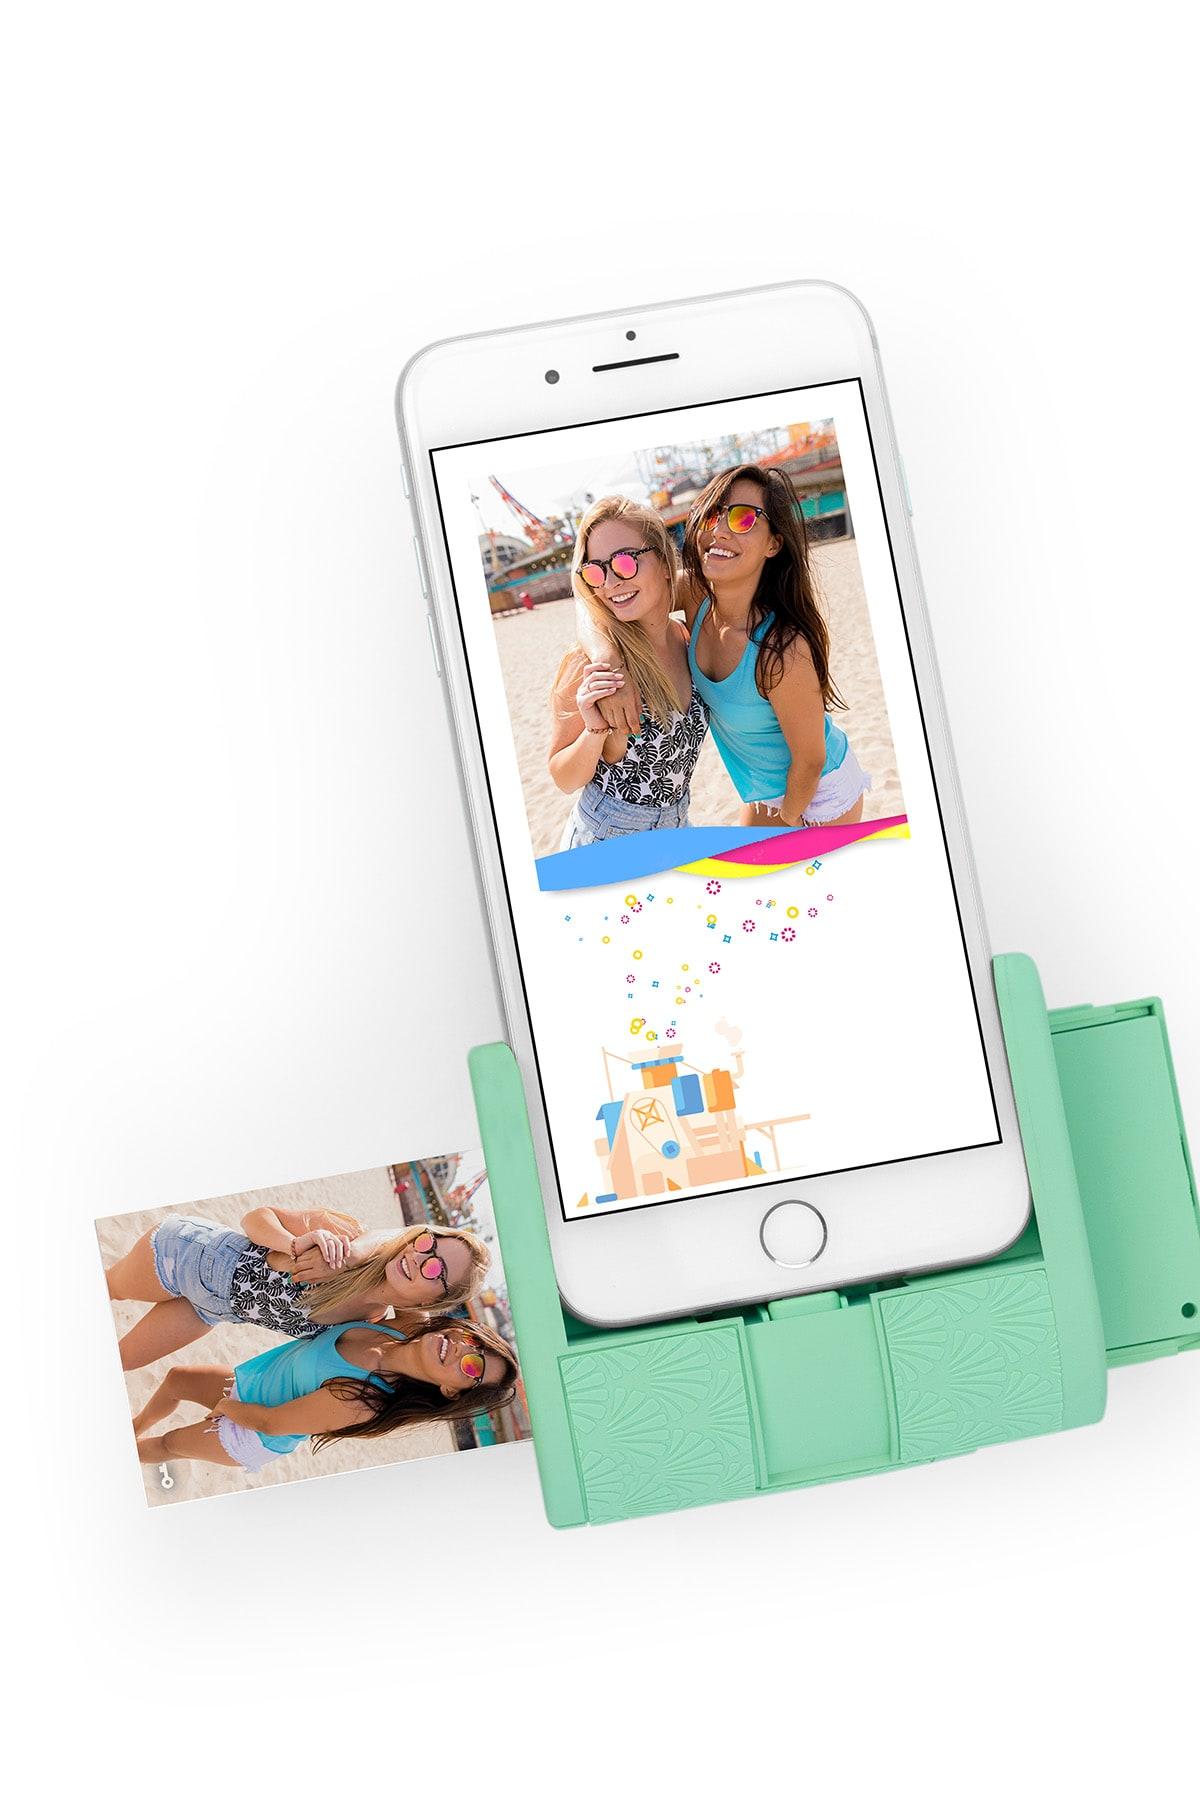 new styles 1fa11 e6a51 Prynt Pocket iPhone Printer